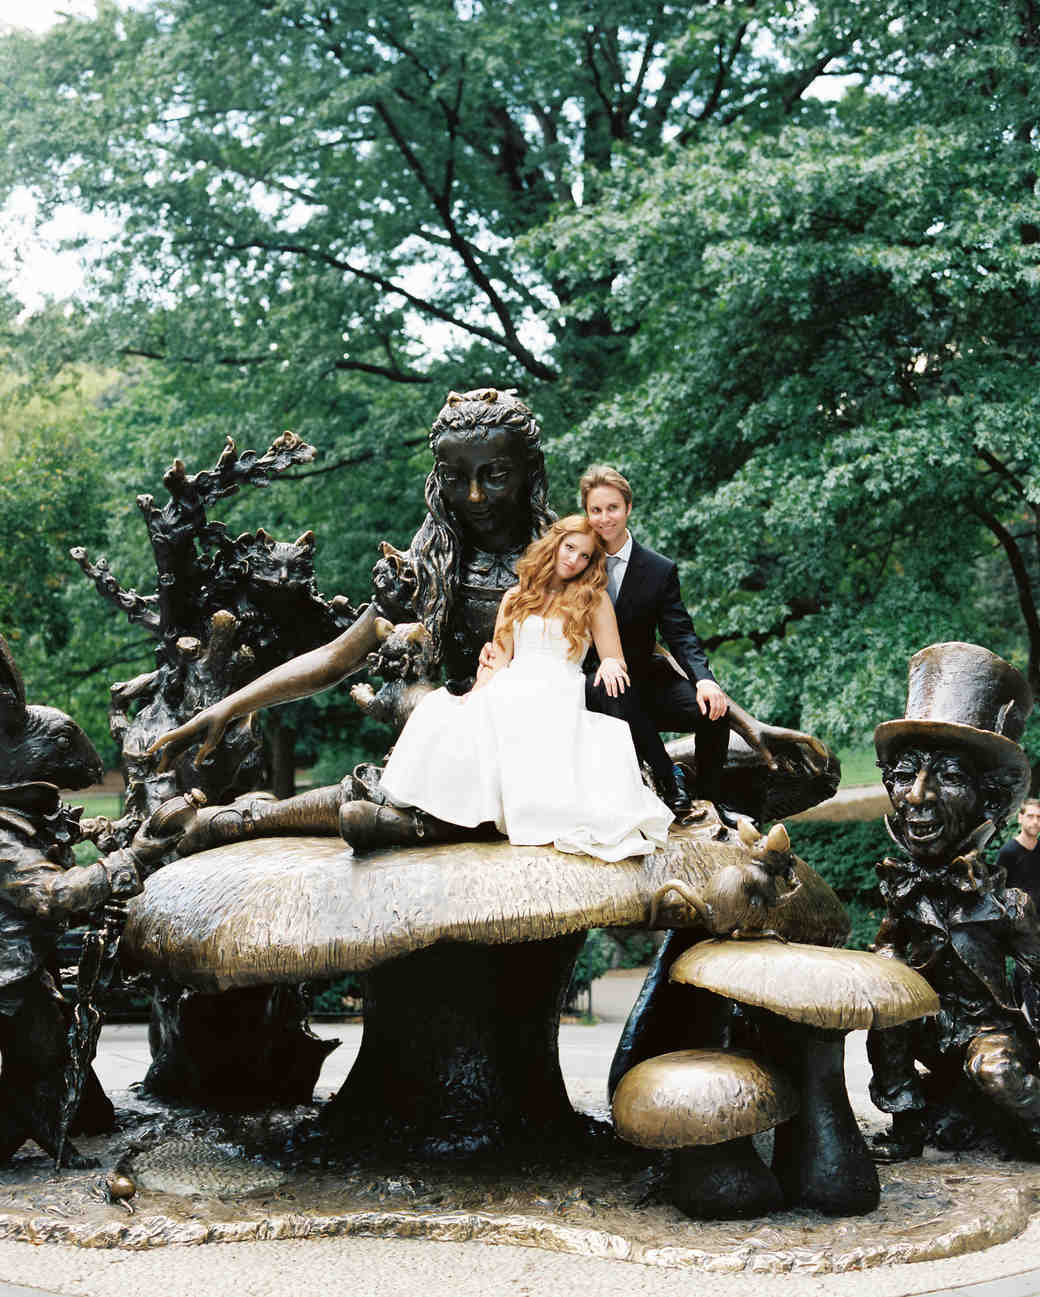 lilly-sean-wedding-couple-00150-s112089-0815.jpg